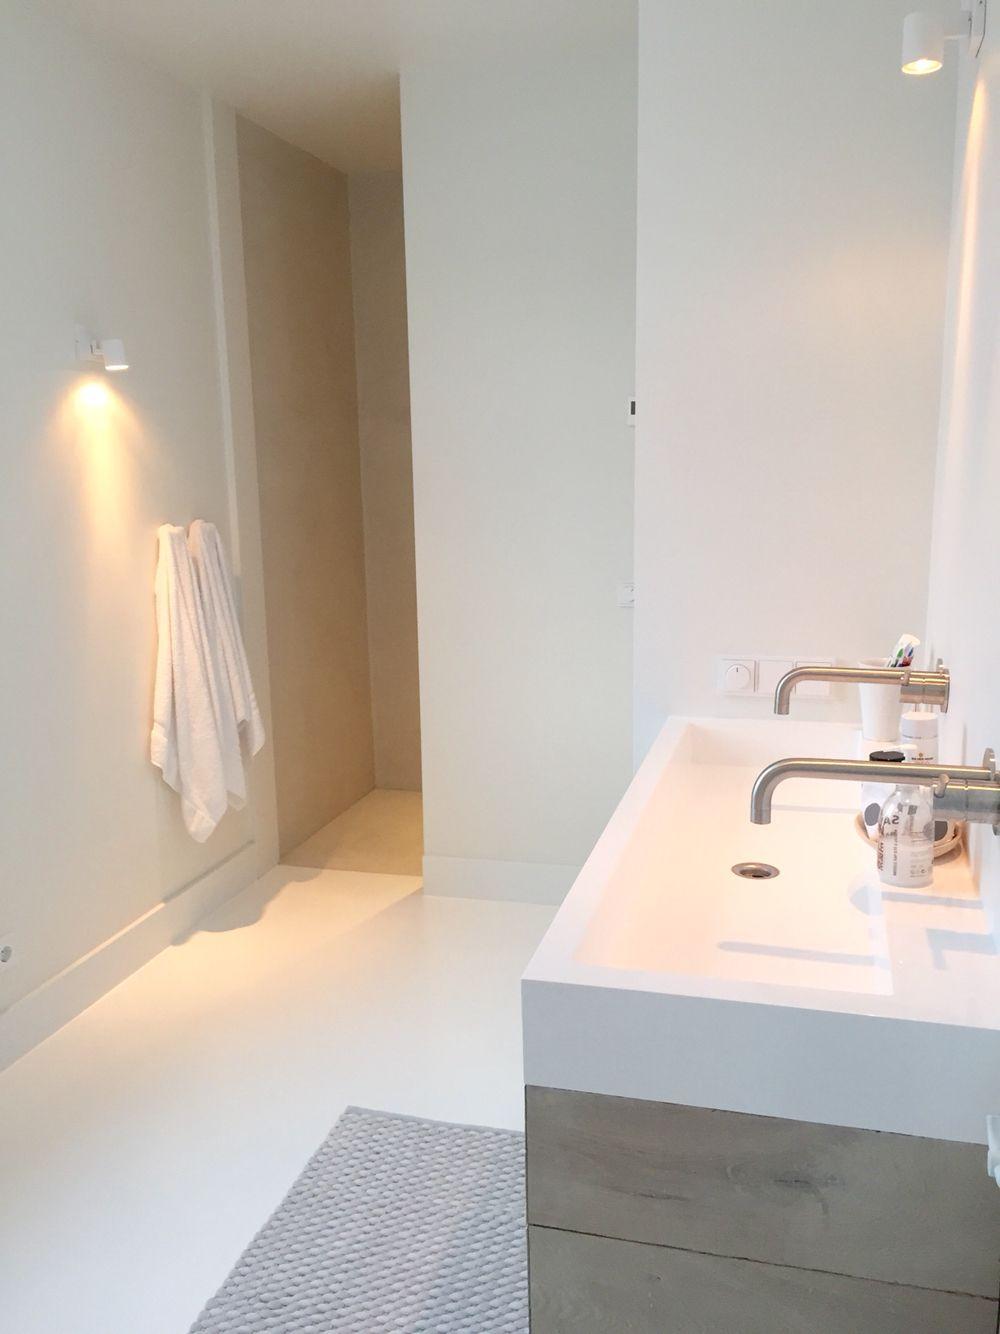 lavabo grande 2 grifos bano padres   Baño   Pinterest   Bath ...